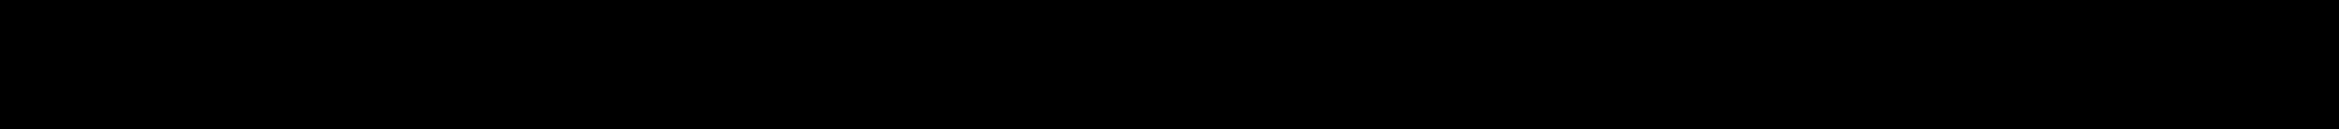 Le Havre Hand Centerline Reversed Font by Insigne : Font Bros